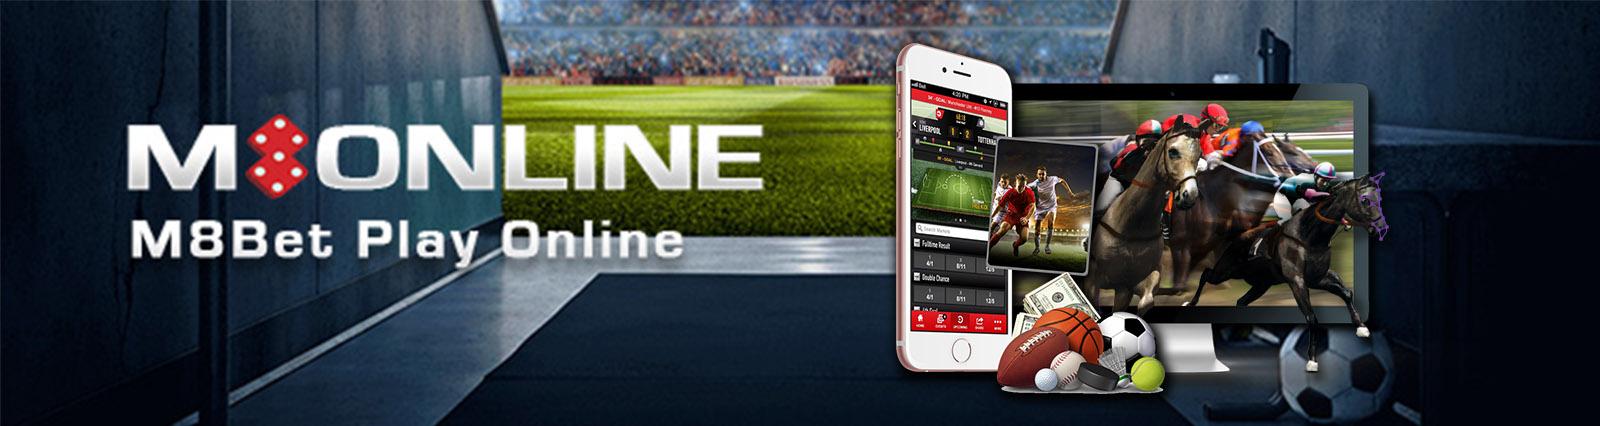 3mbet-online-sportsbetting